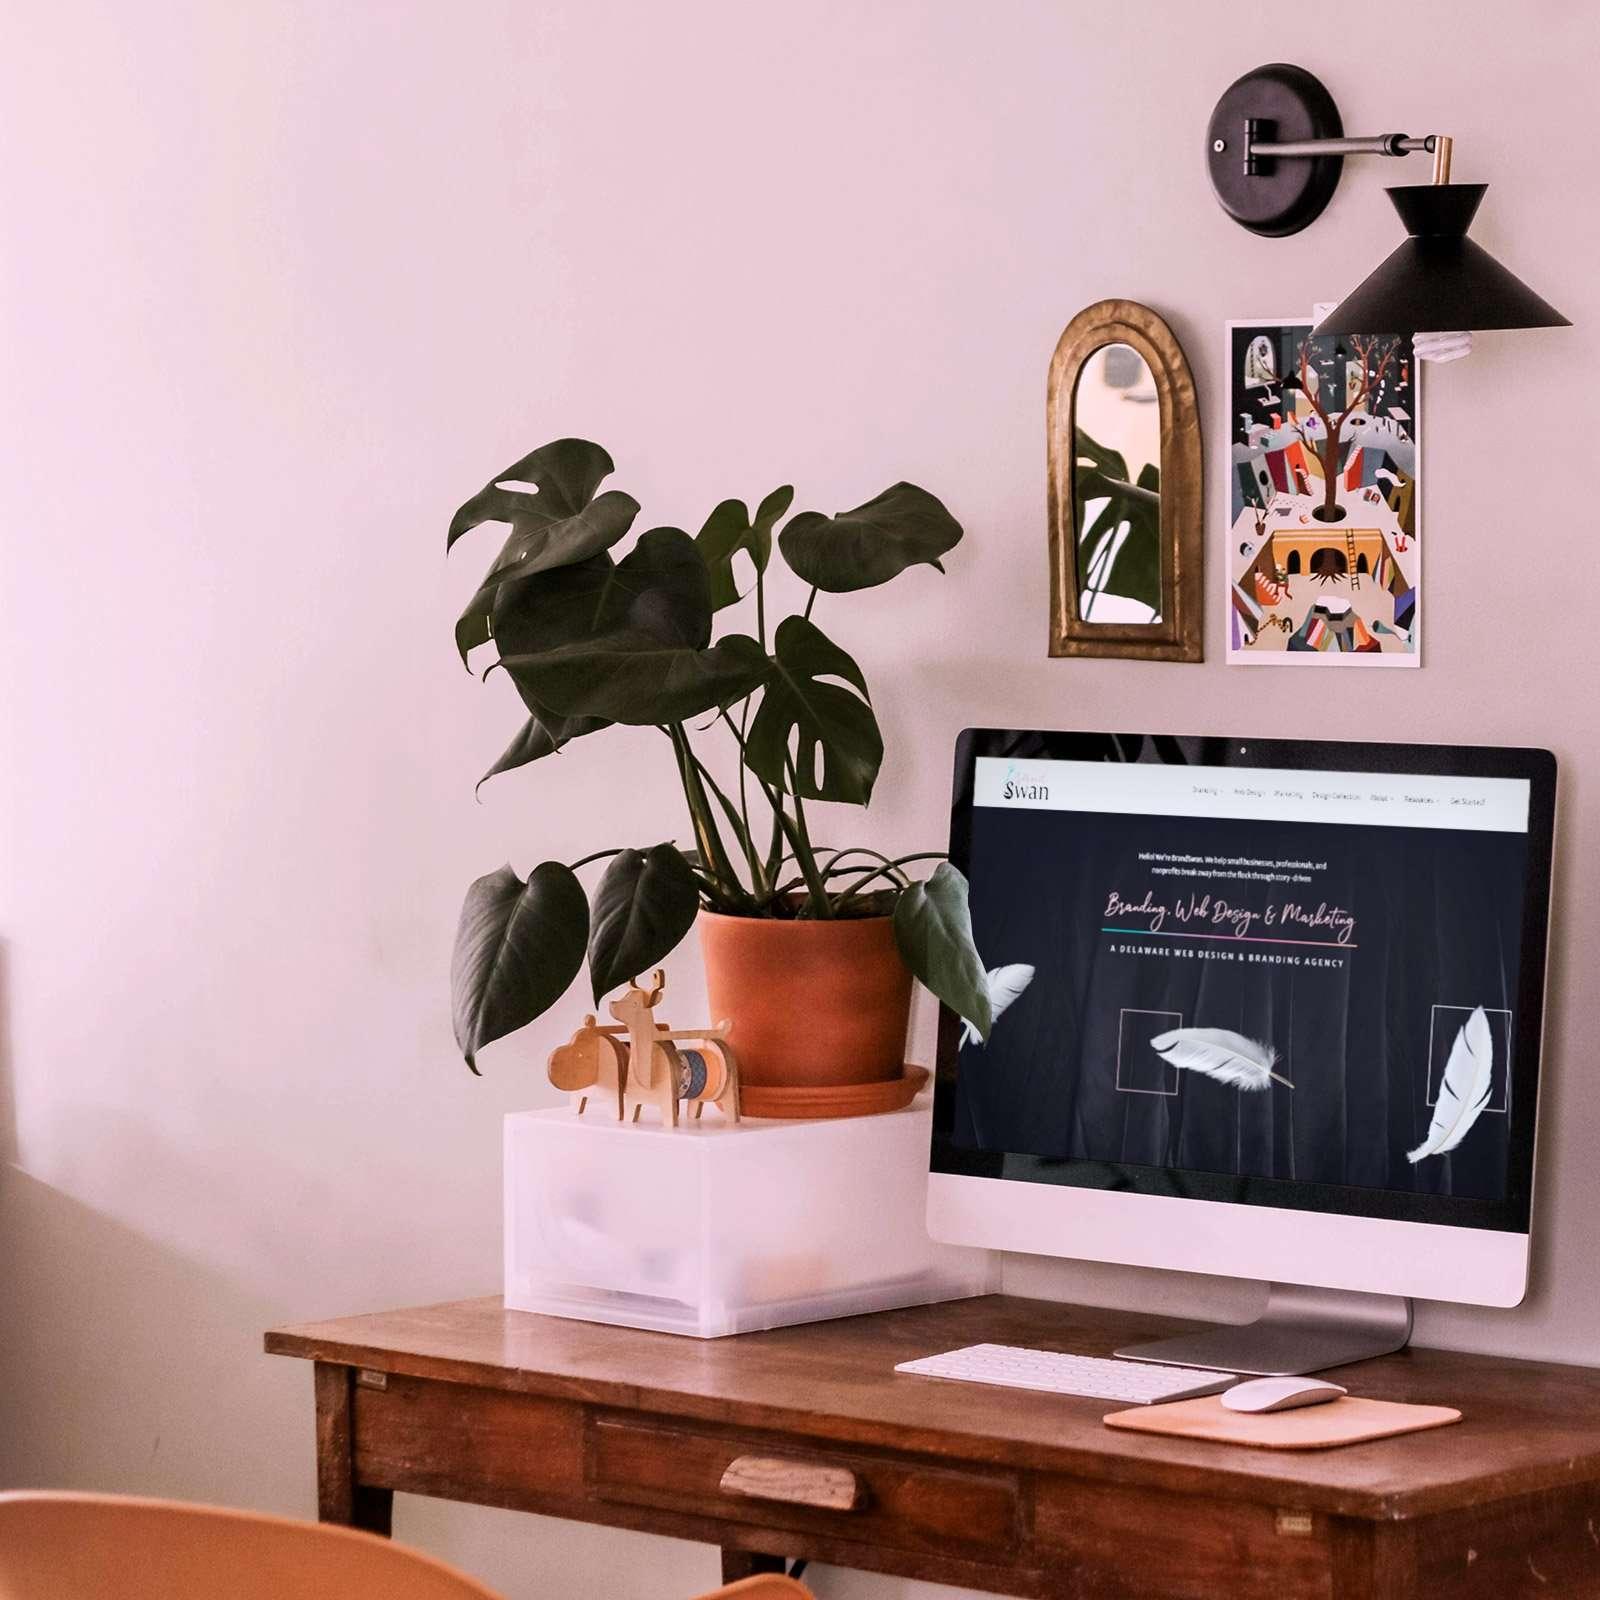 Website design for BrandSwan, a branding, web design, and marketing agency in Delaware